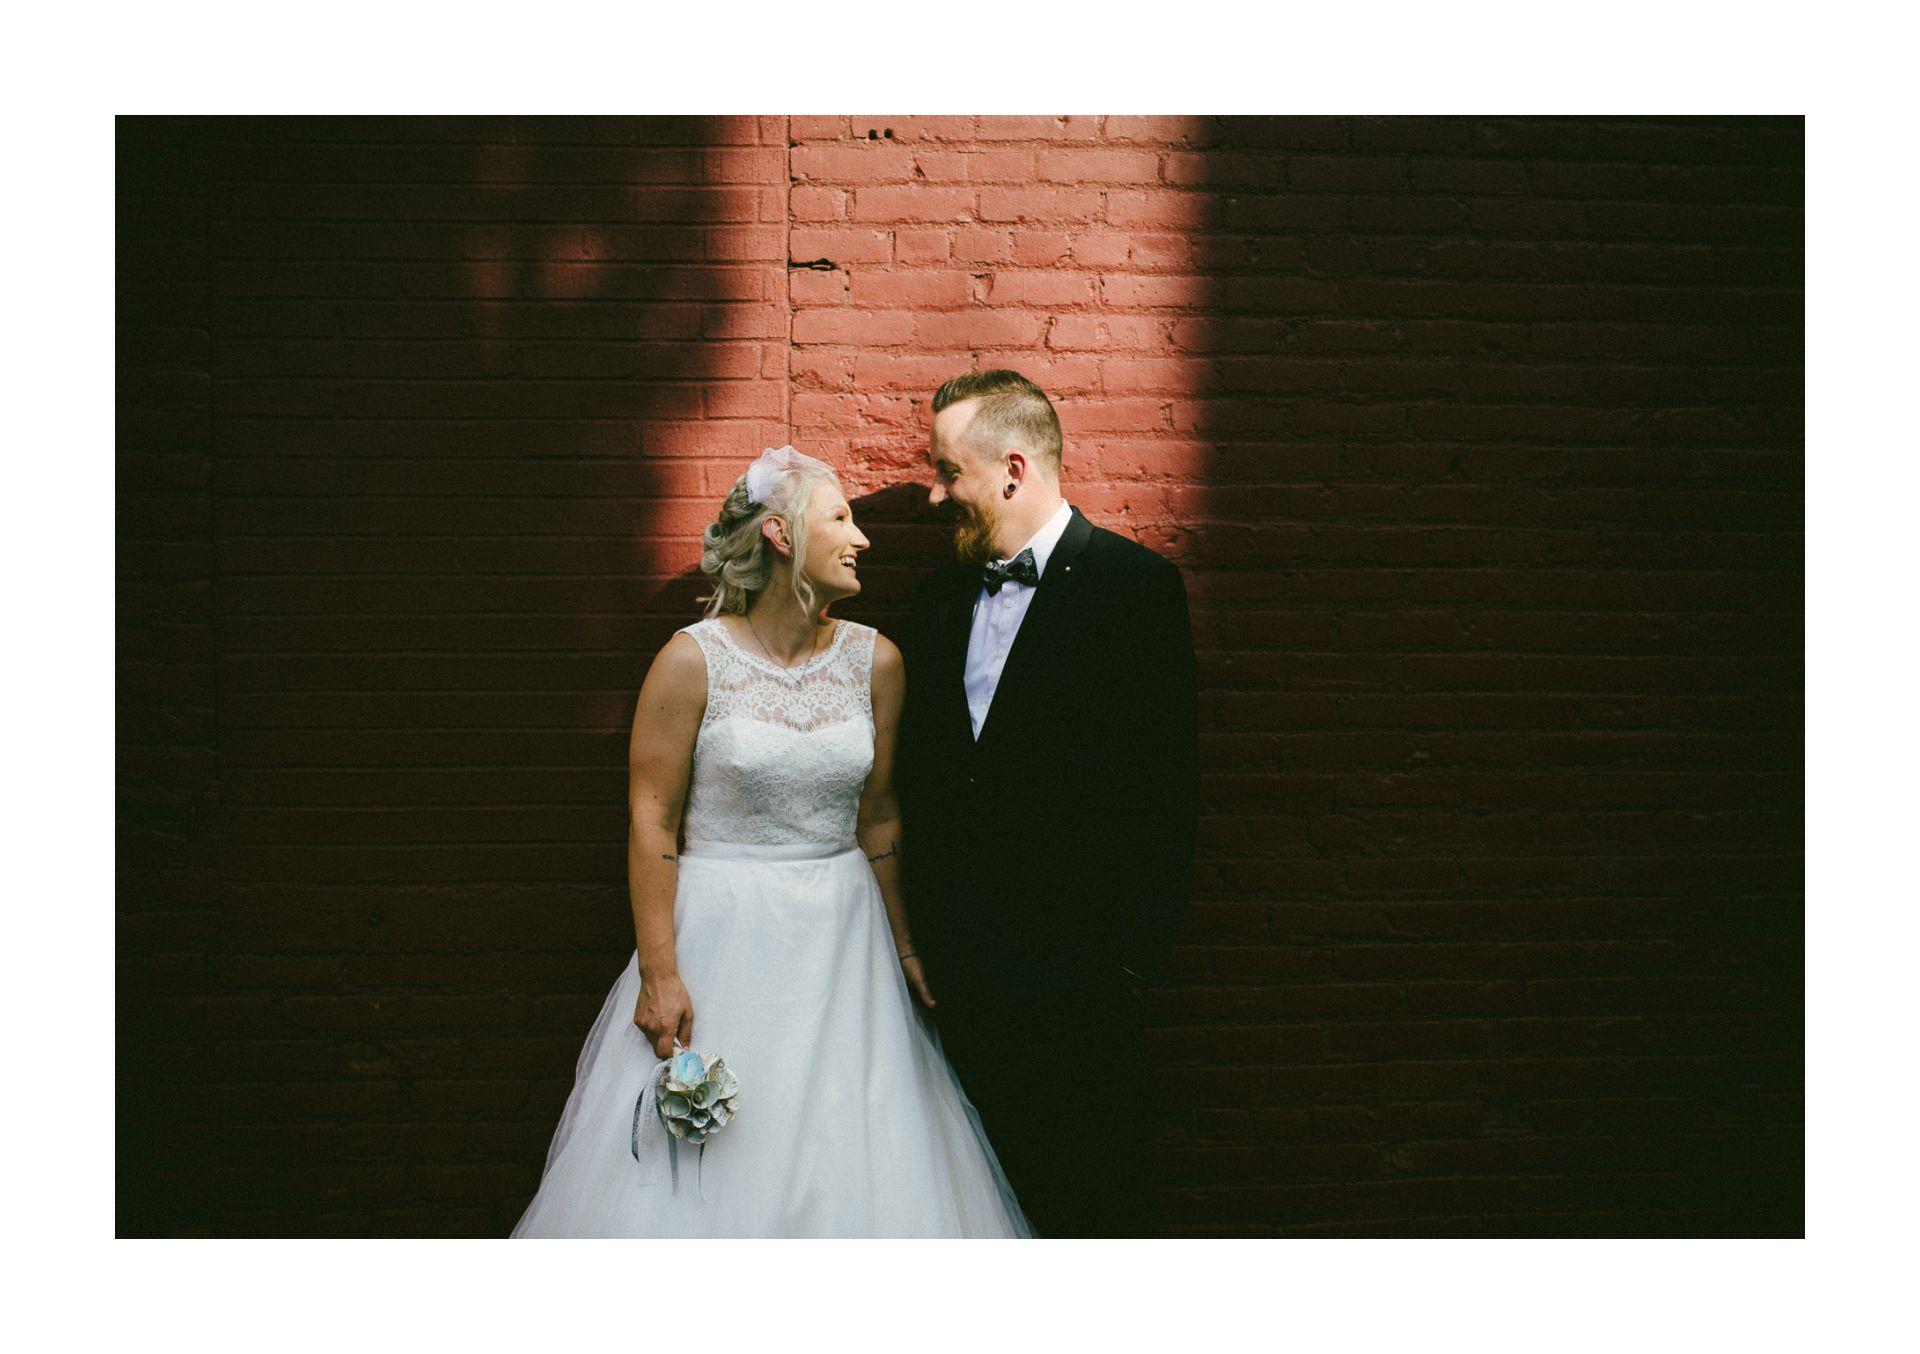 Goldhorn Brewery Wedding Photos in Cleveland 2 5.jpg